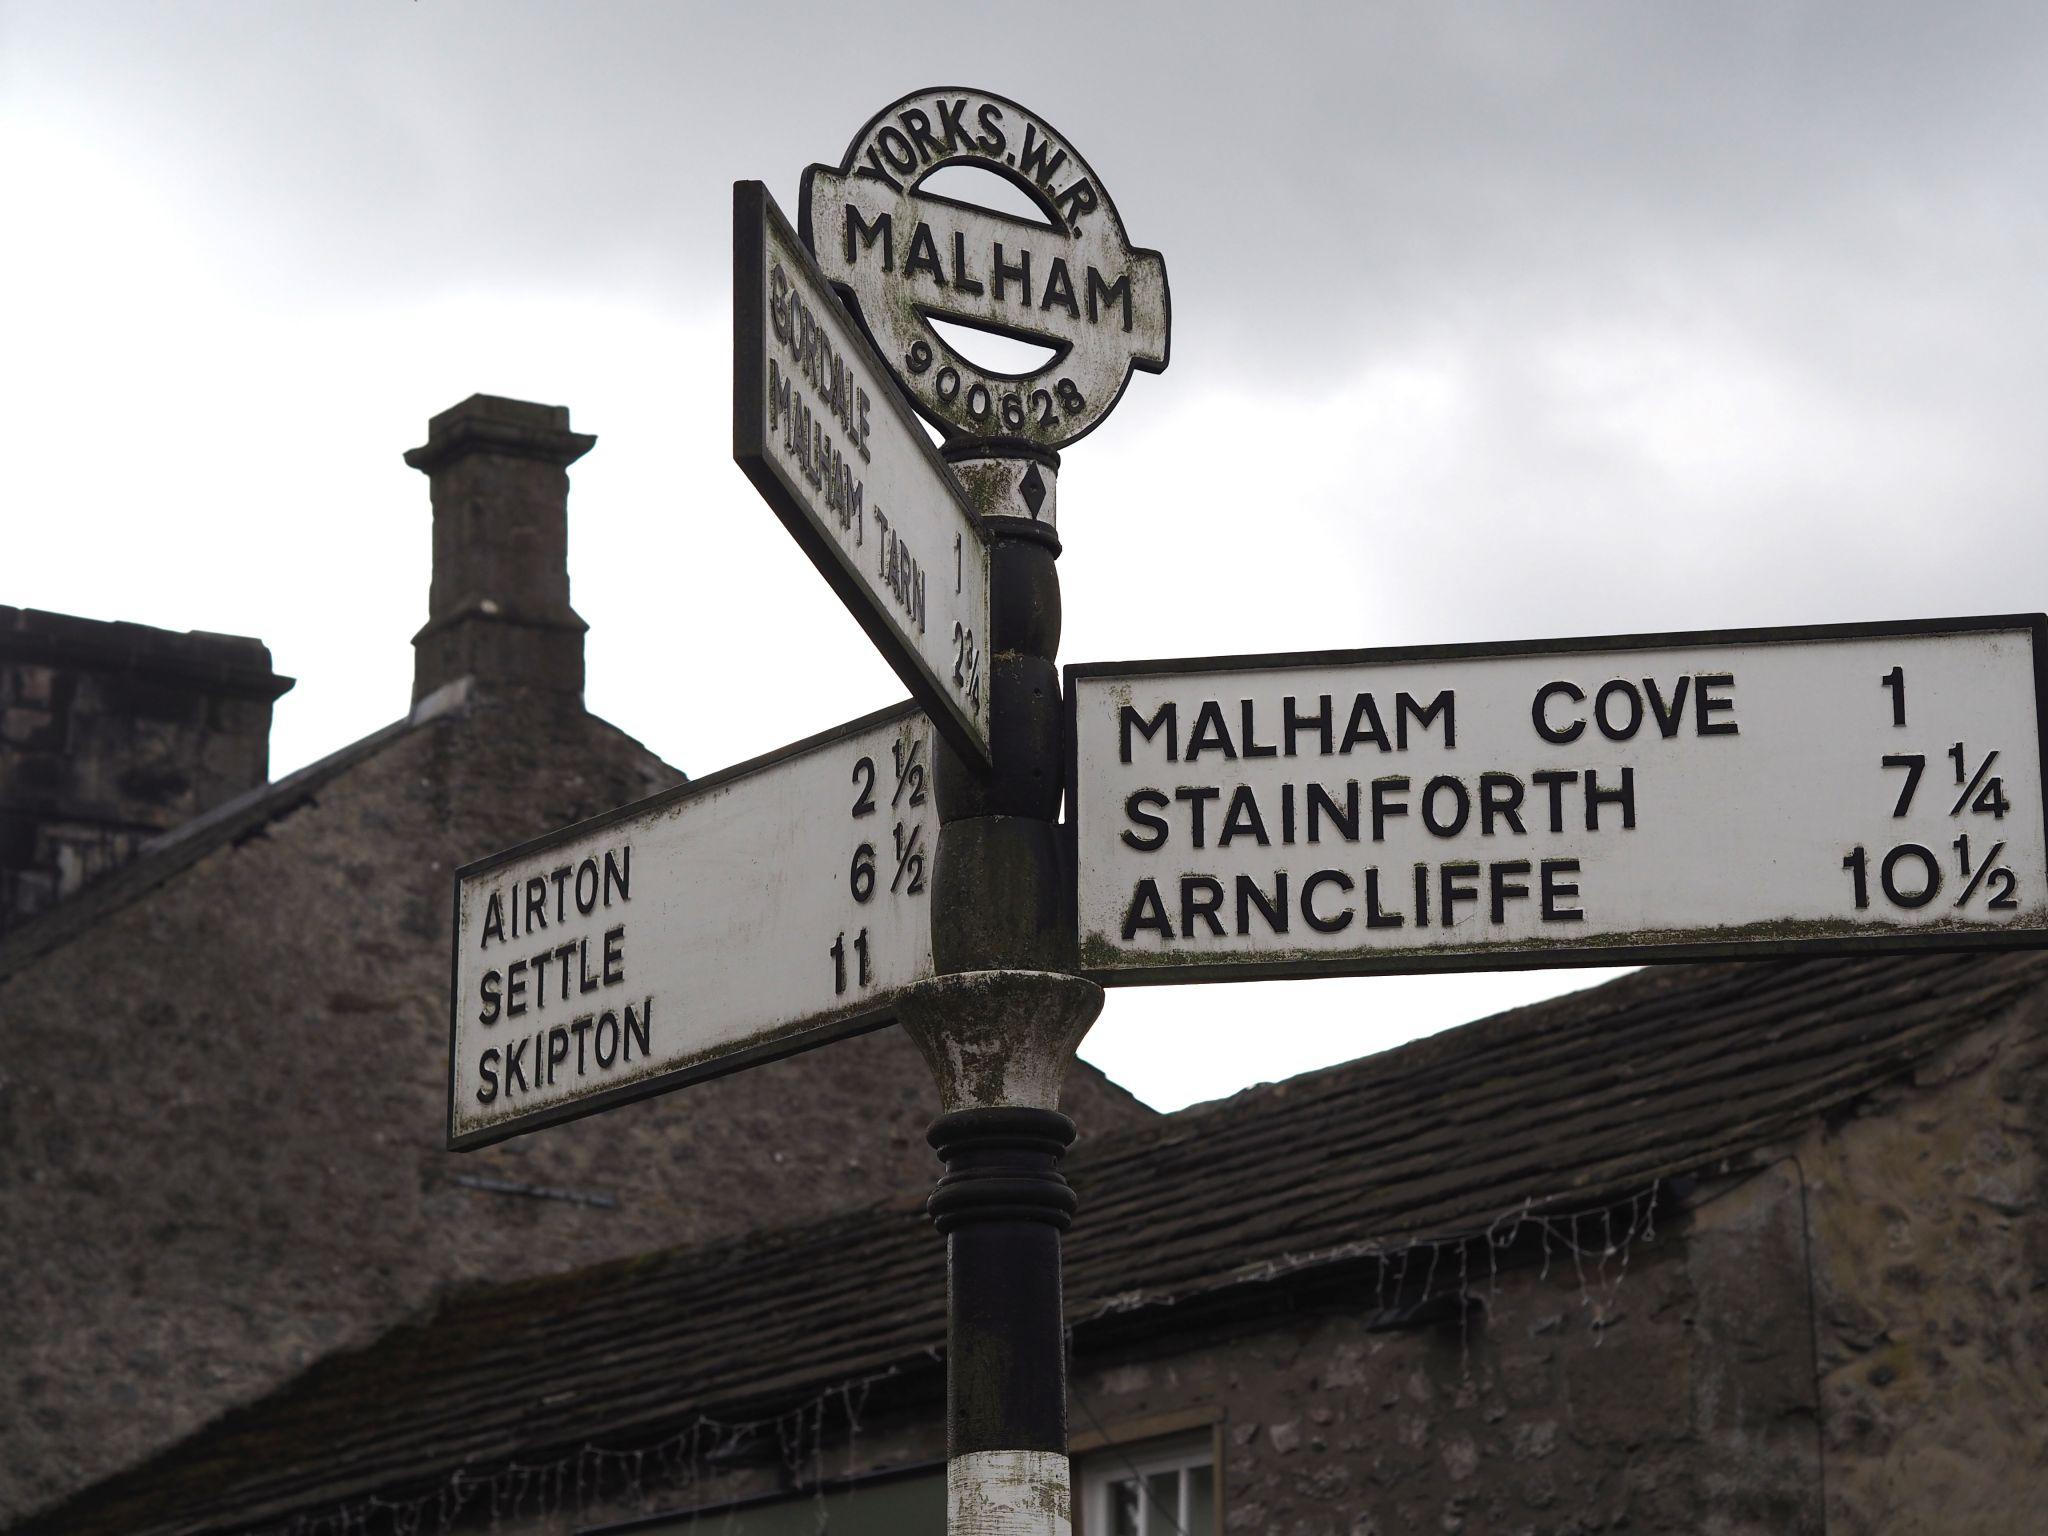 Malham signpost